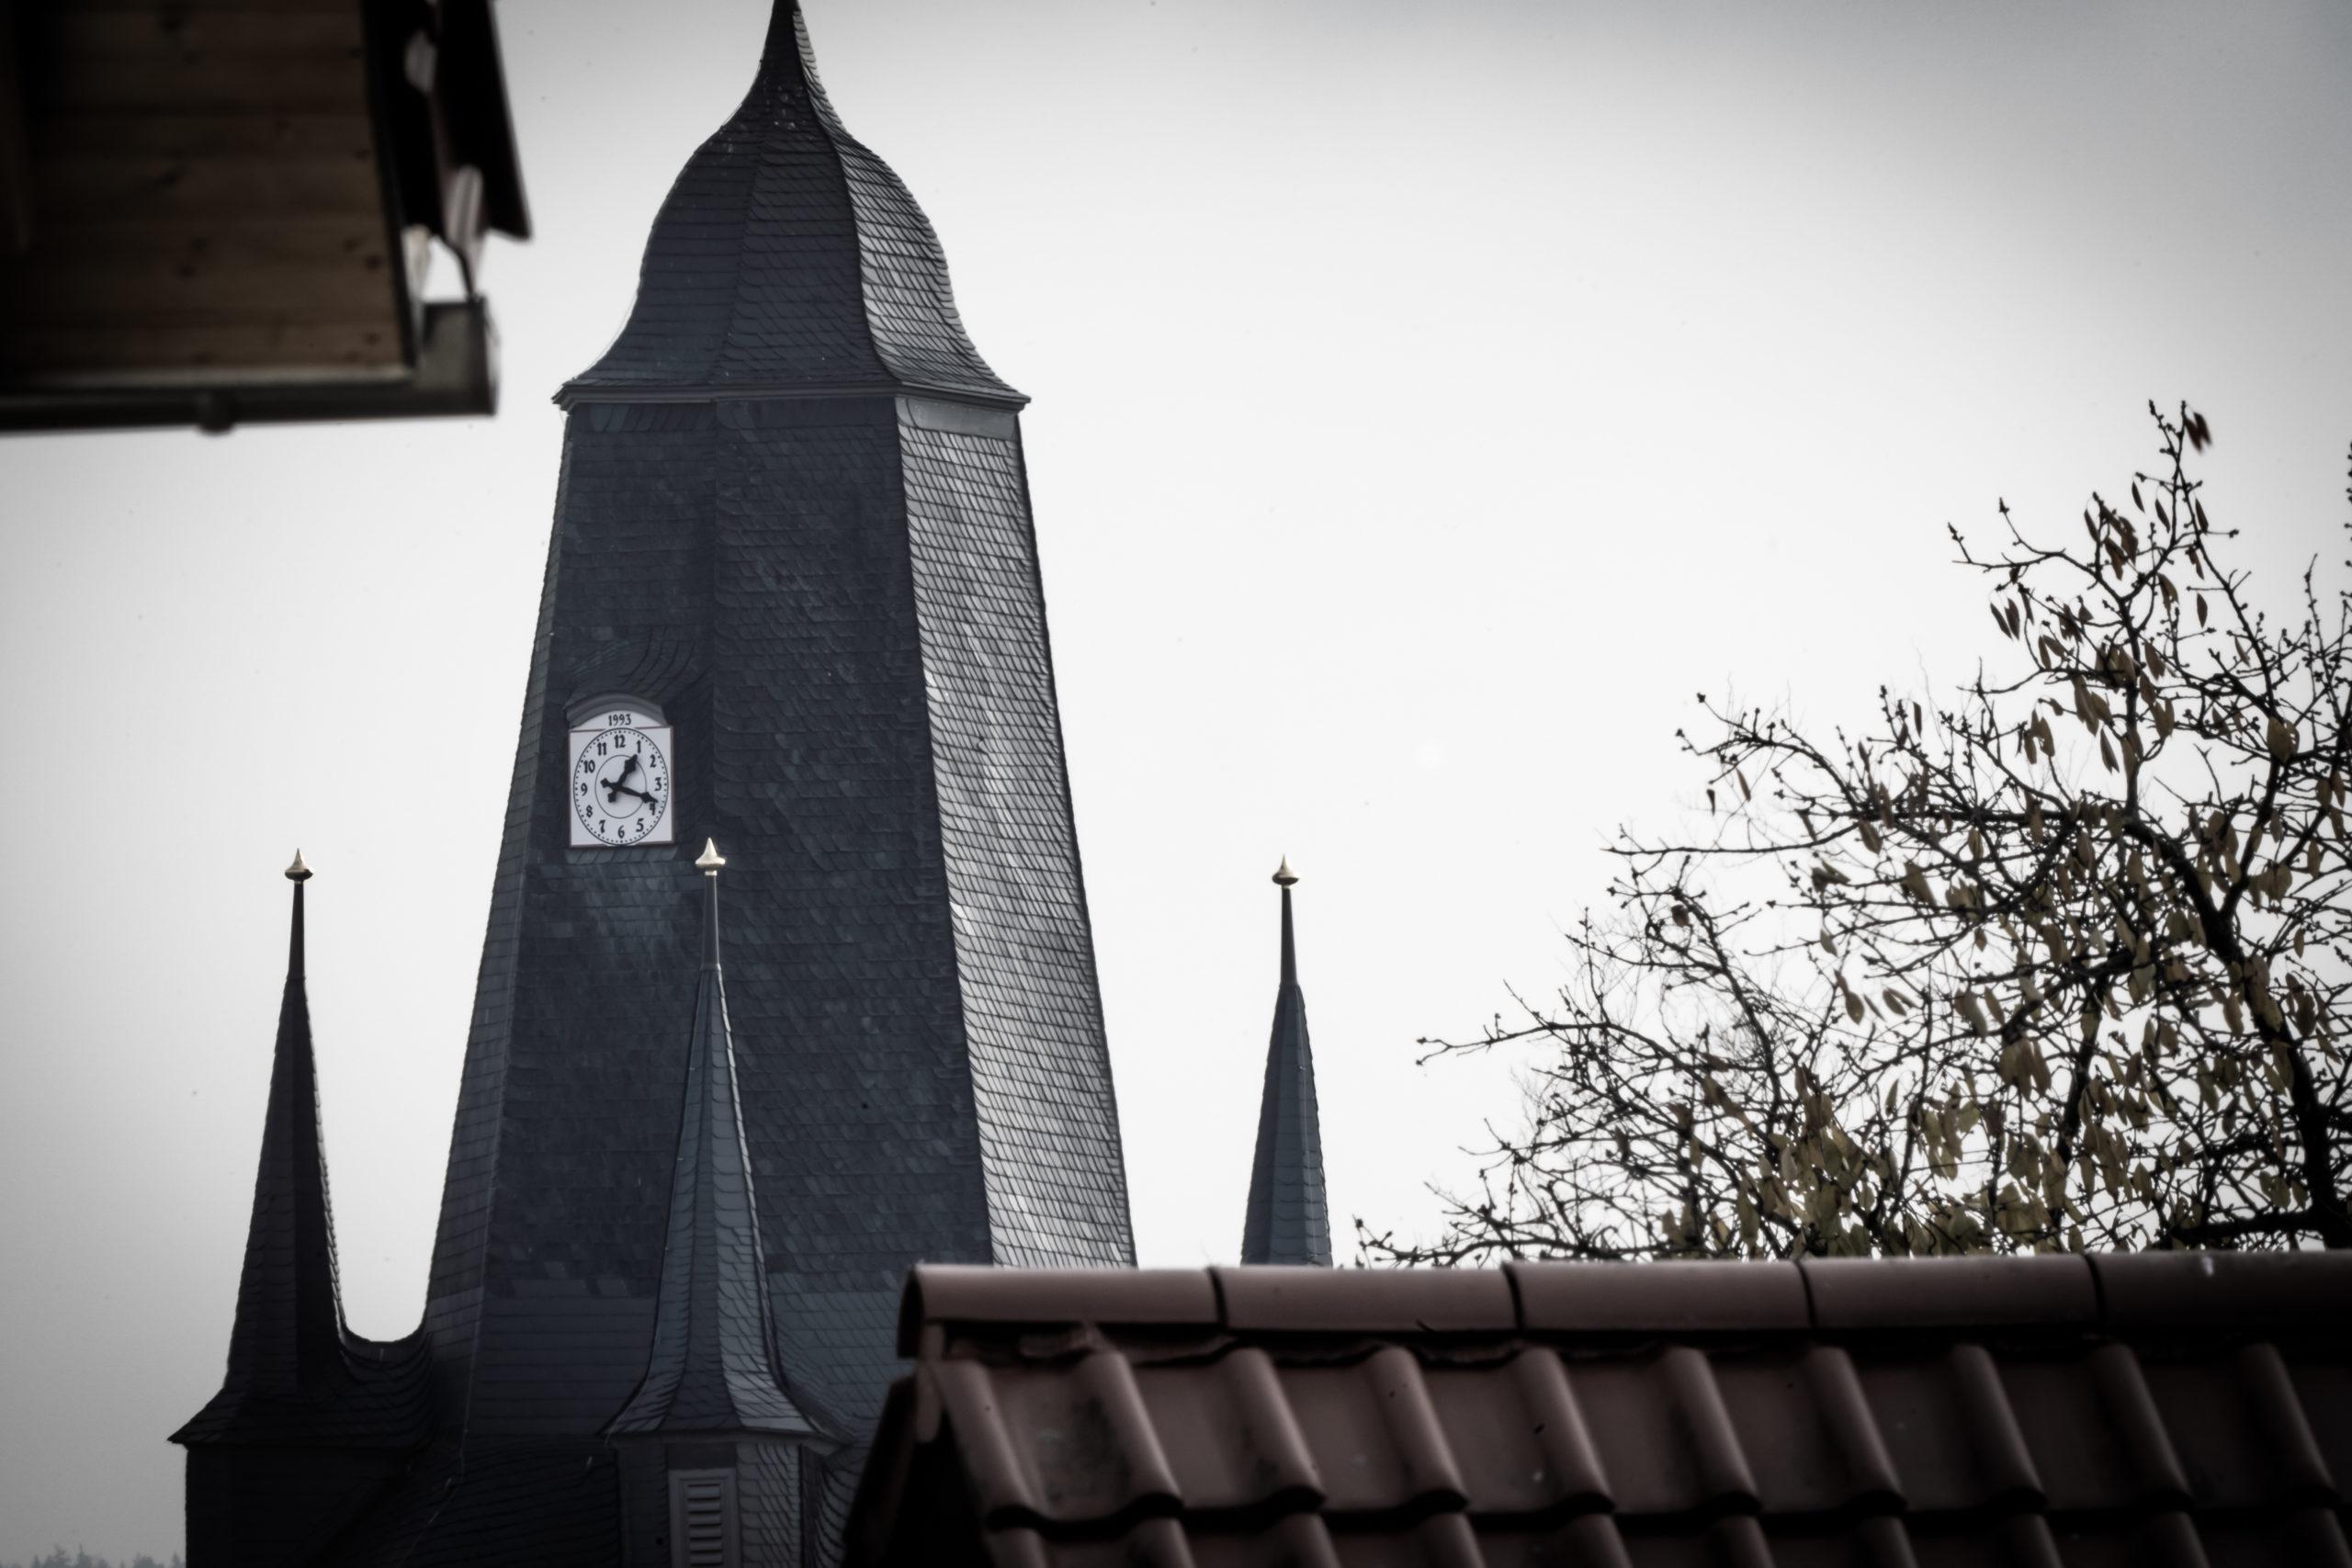 2019-11, Untersuhler Rundkirche, Bildautor Wolle Ing, www.wolle-ing.de